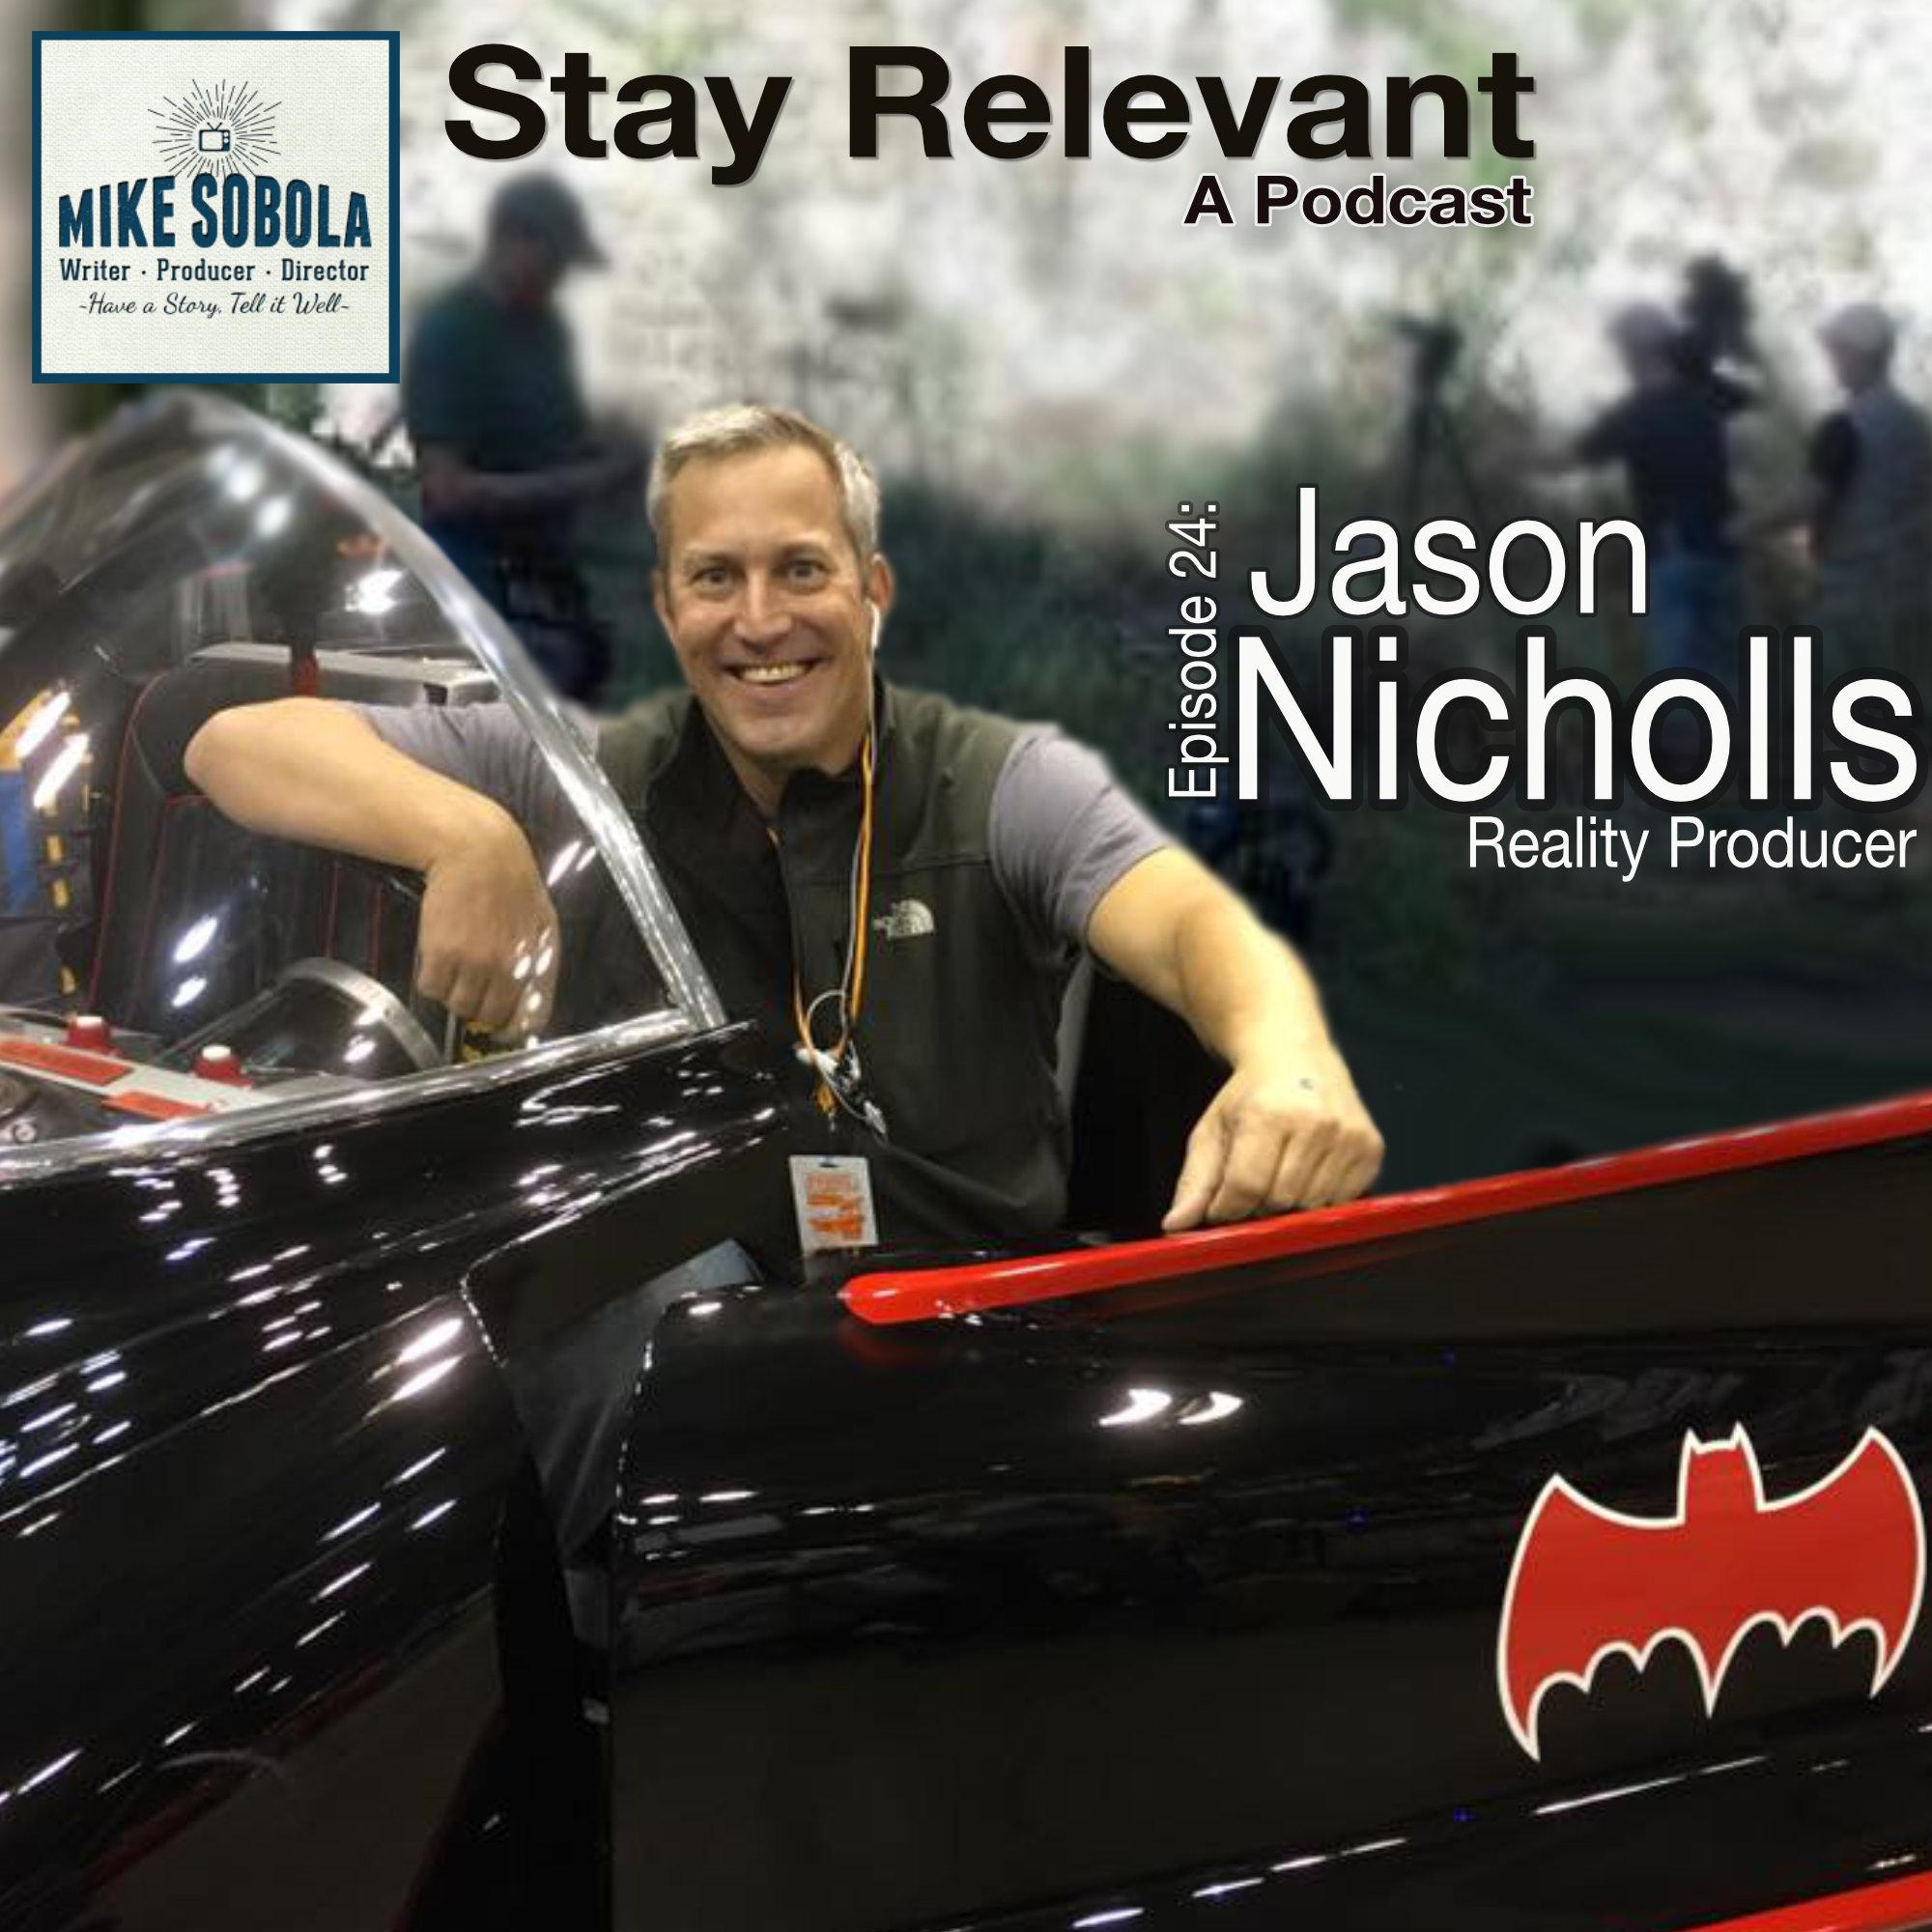 Jason Nicholls on Producing Reality TV